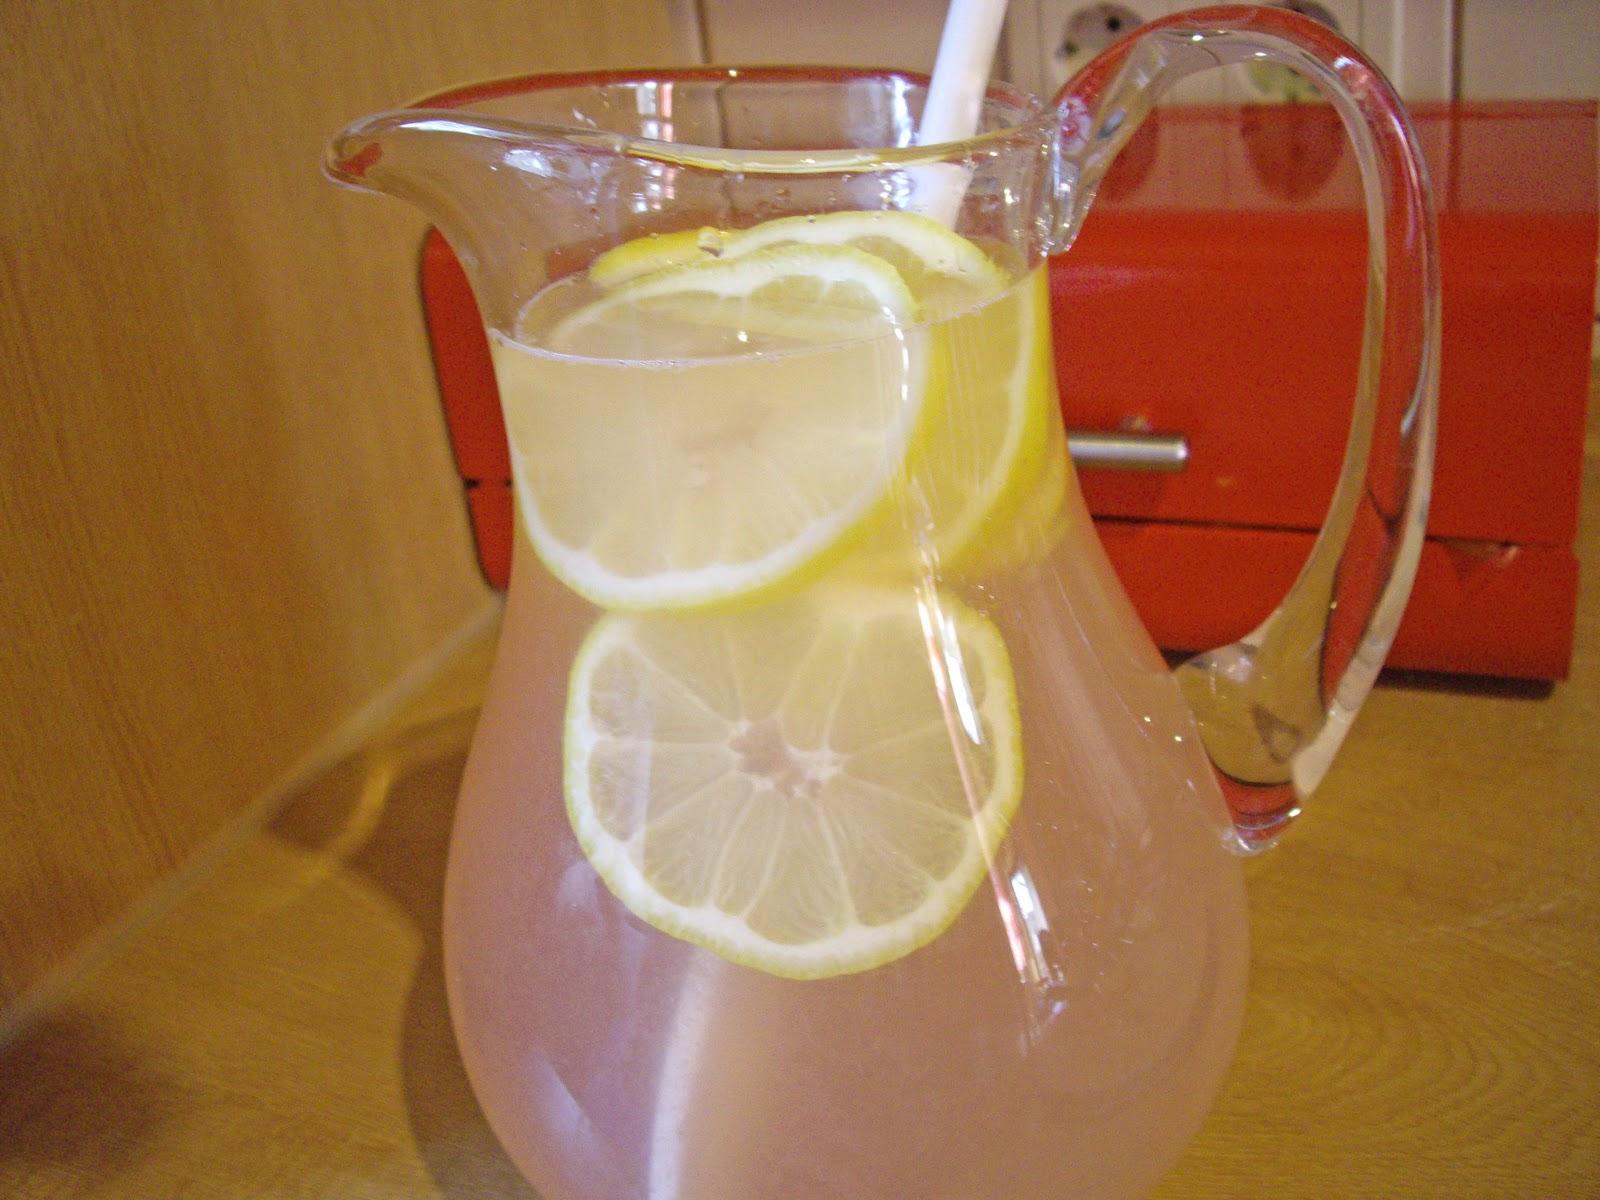 http://1.bp.blogspot.com/-DZvDSRXmNZg/TZG0HWkVSWI/AAAAAAAAABw/TtCuOWEVTxI/s1600/Pink+Lemonade+Tutorial+pics+015+copy.jpg